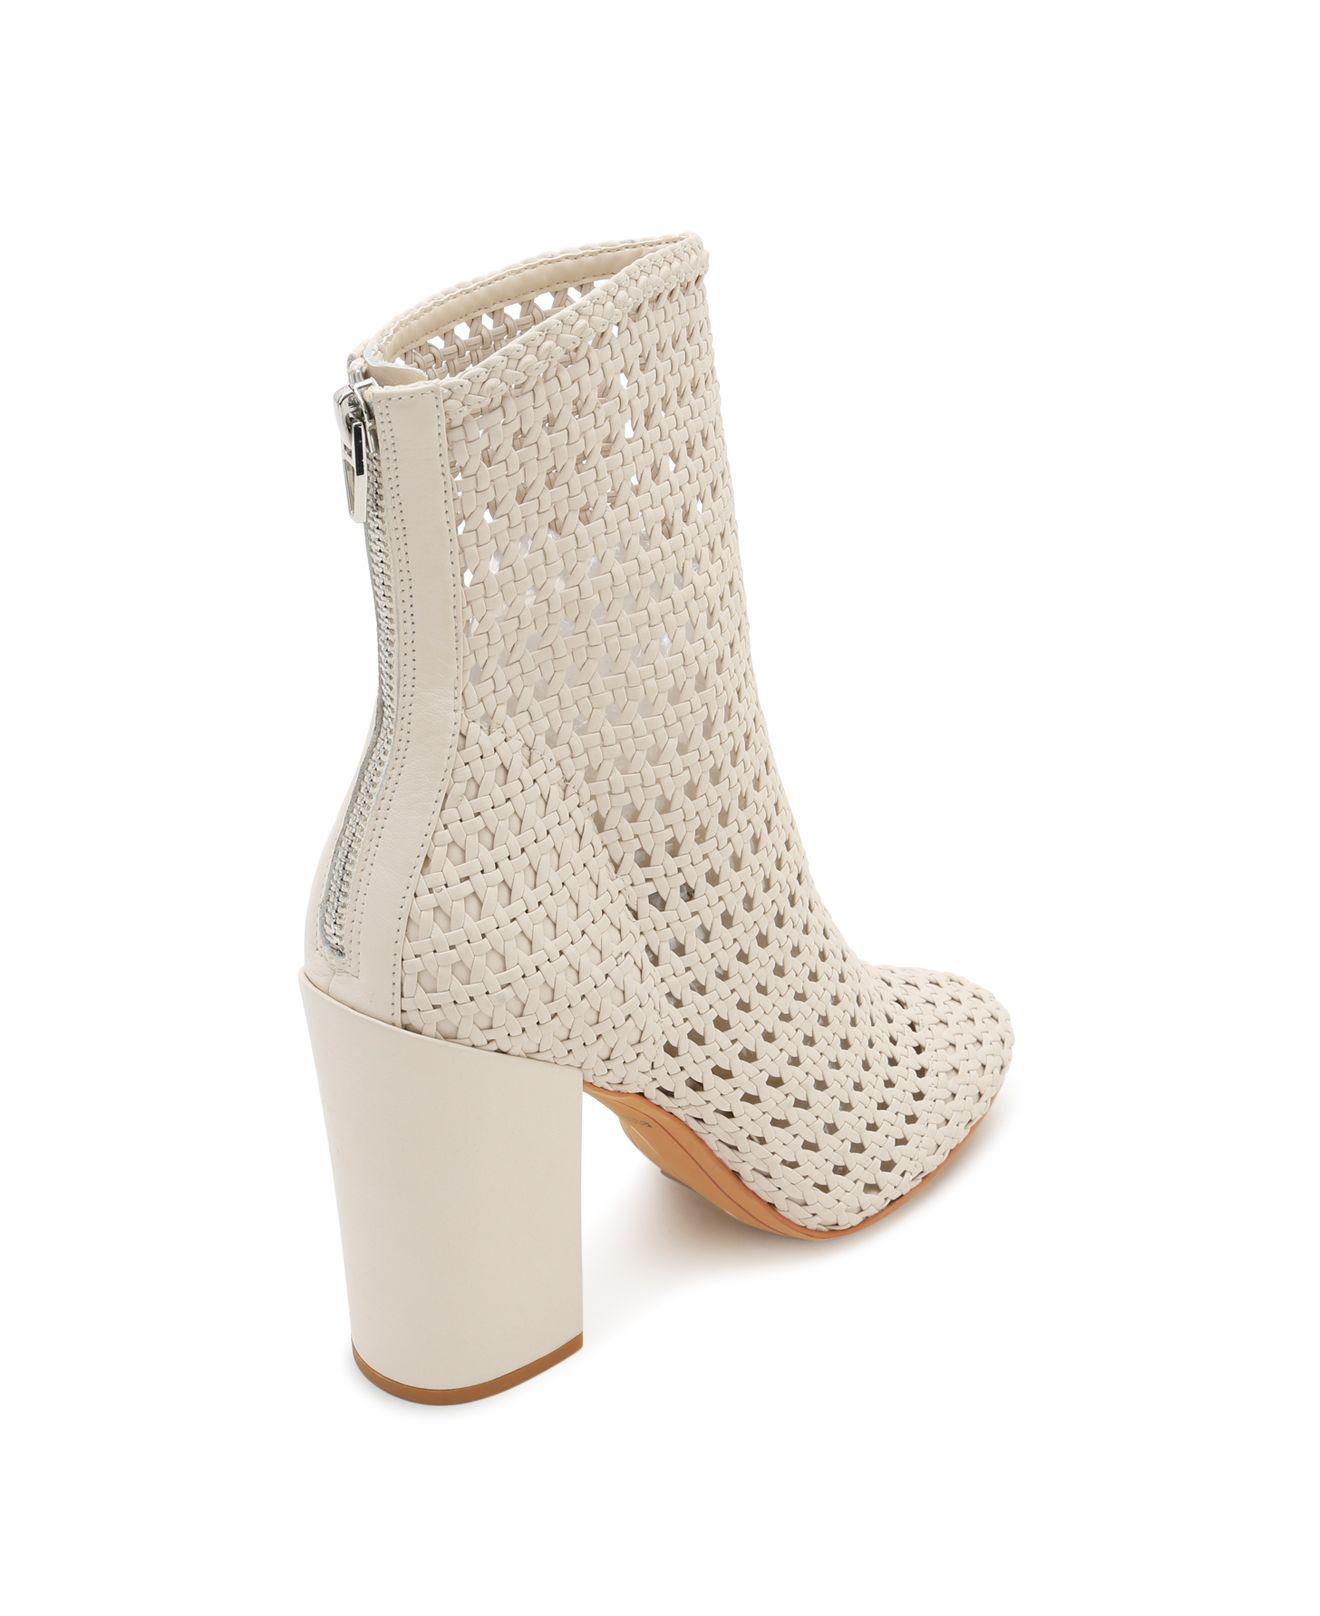 Sale Popular Dolce Vita Women's Woven Leather Block Heel Booties Cheap Great Deals Online Cheap Price Cheap Wholesale XdjOBQK9M